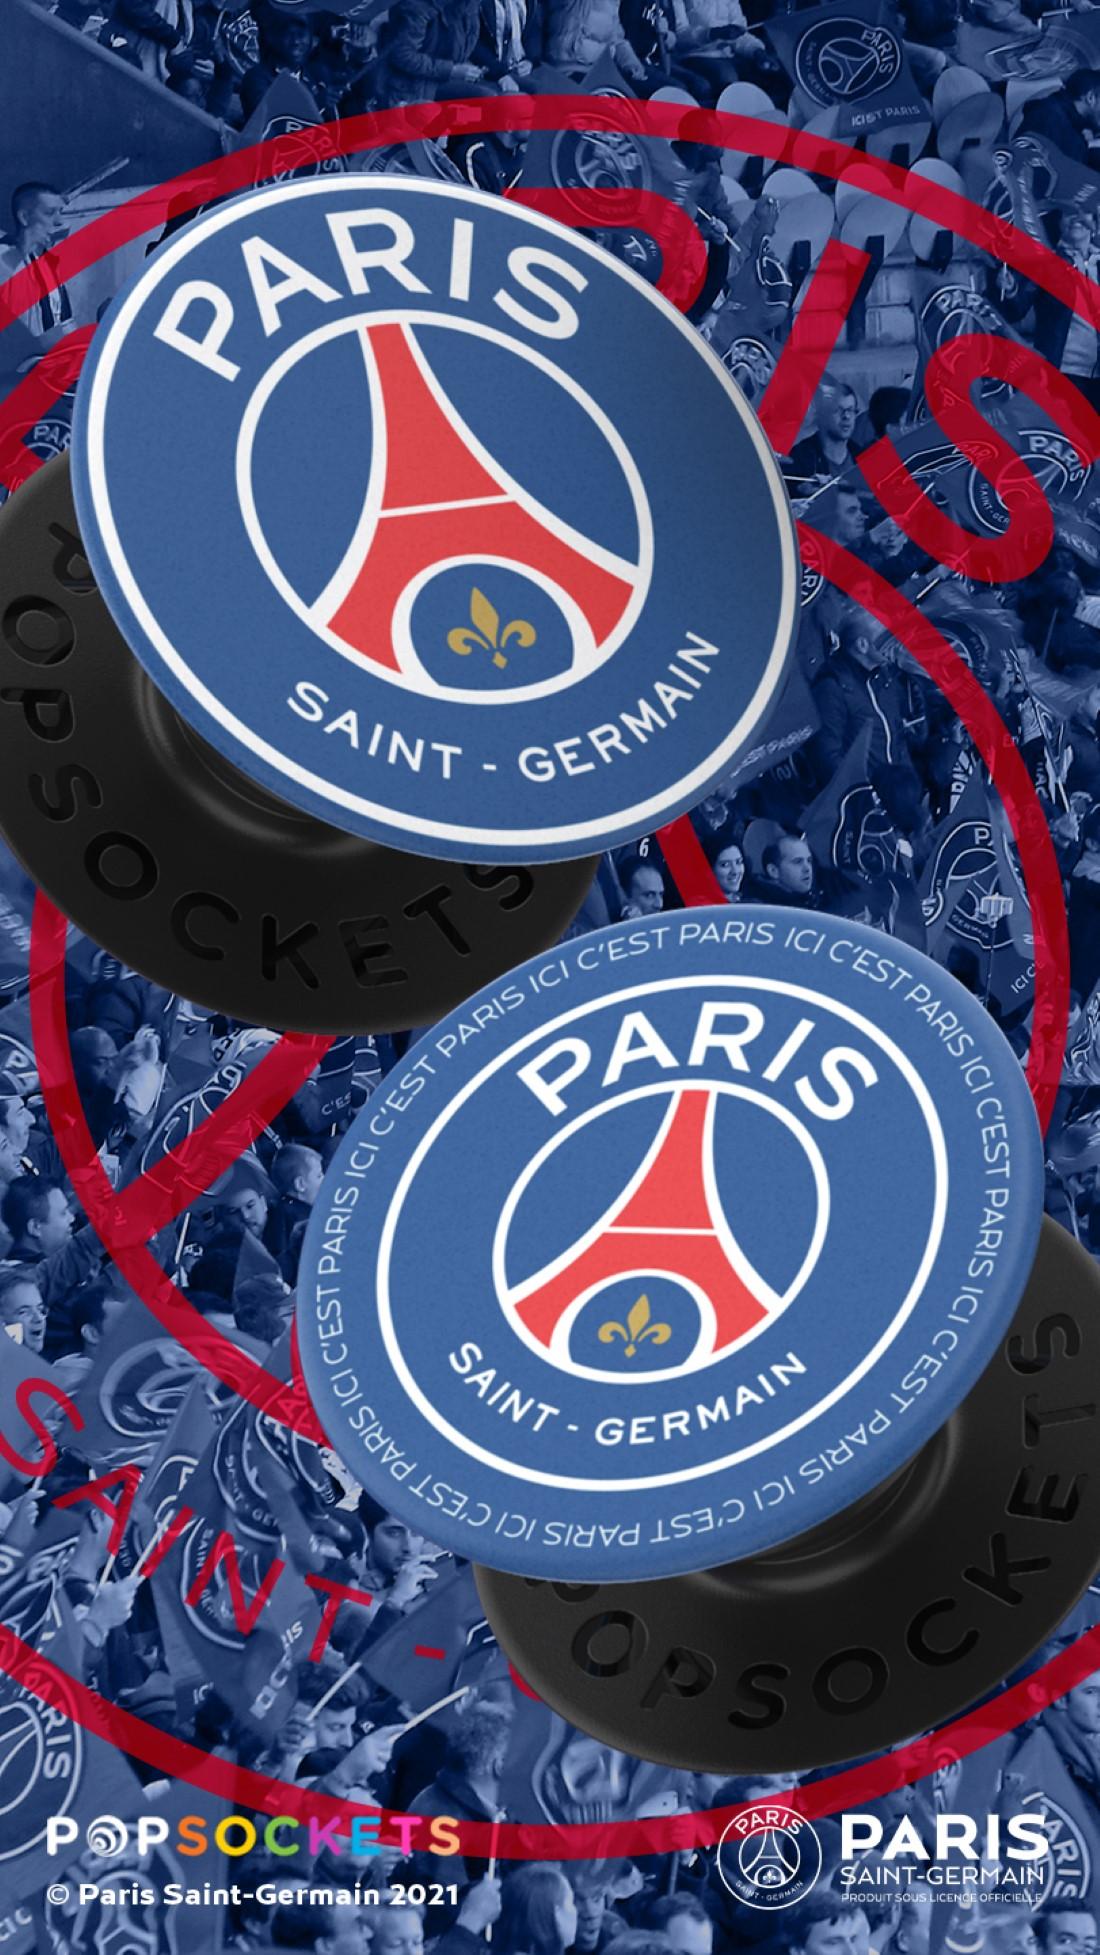 Paris Saint-Germain x Popsockets